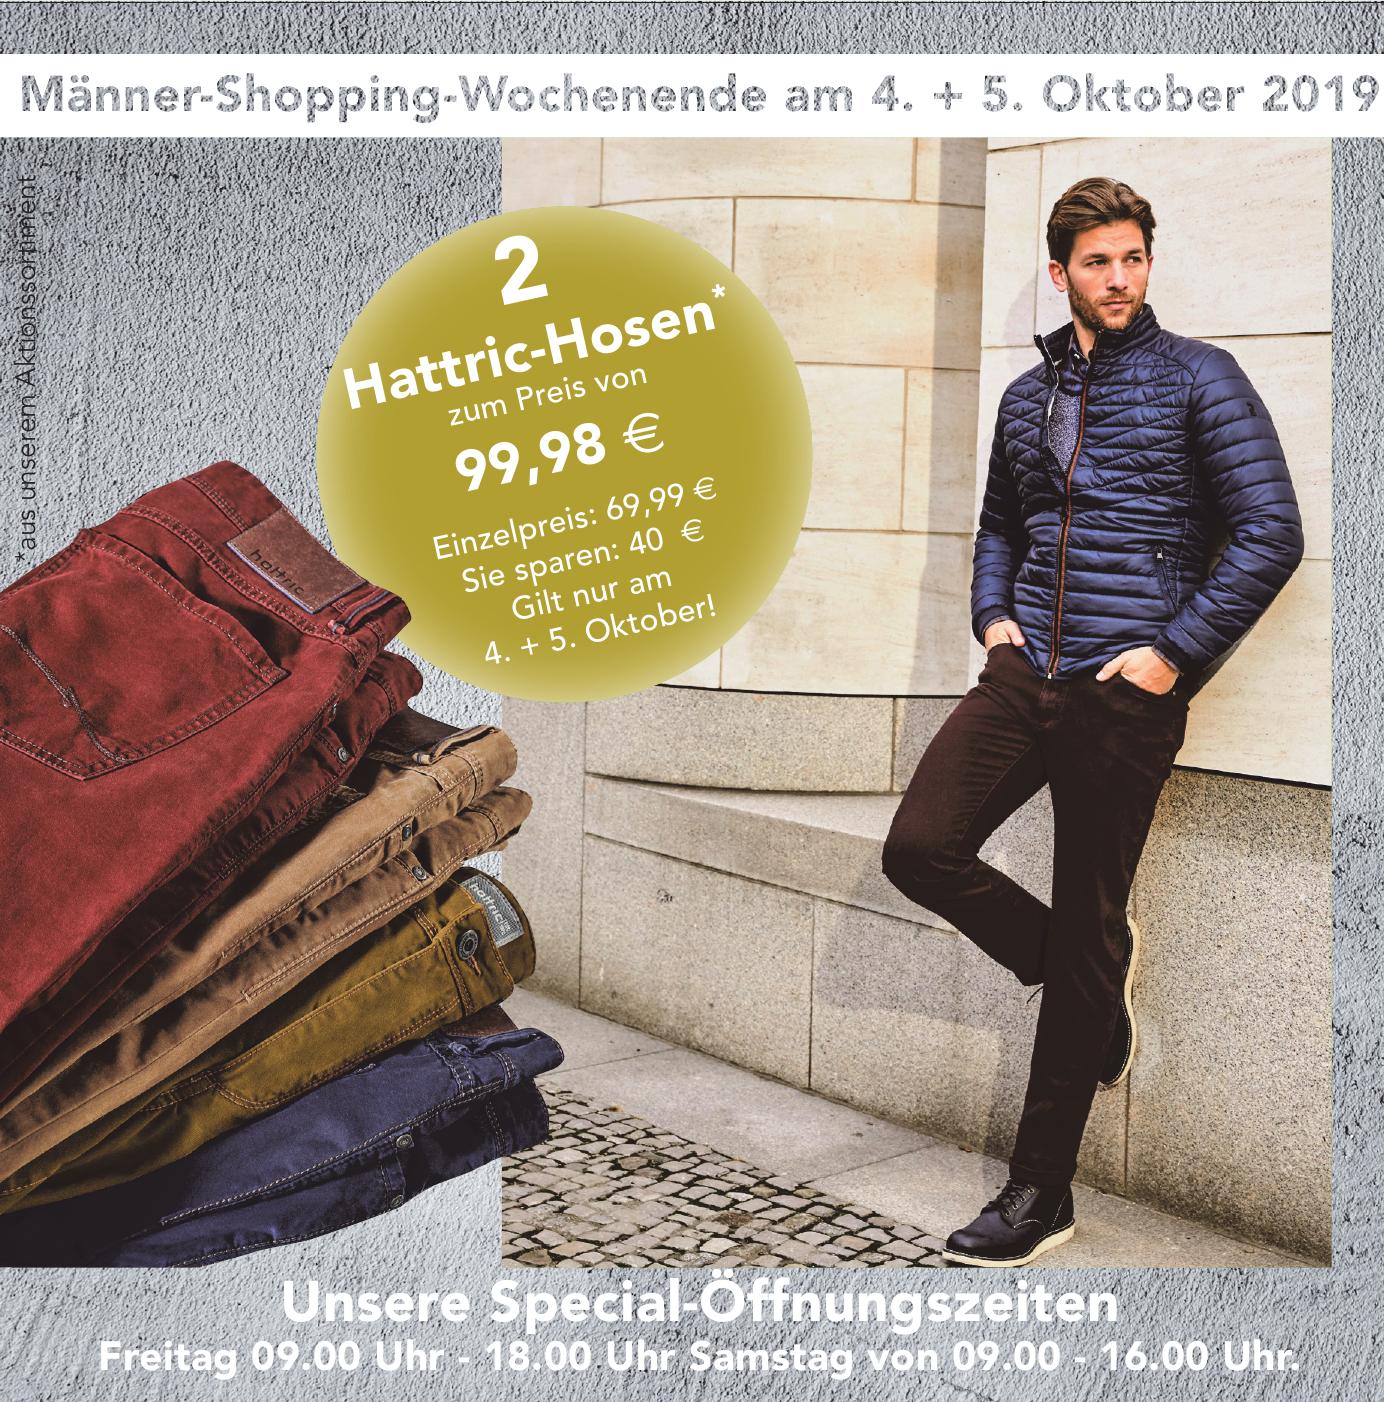 Männer-Shopping-Wochenende